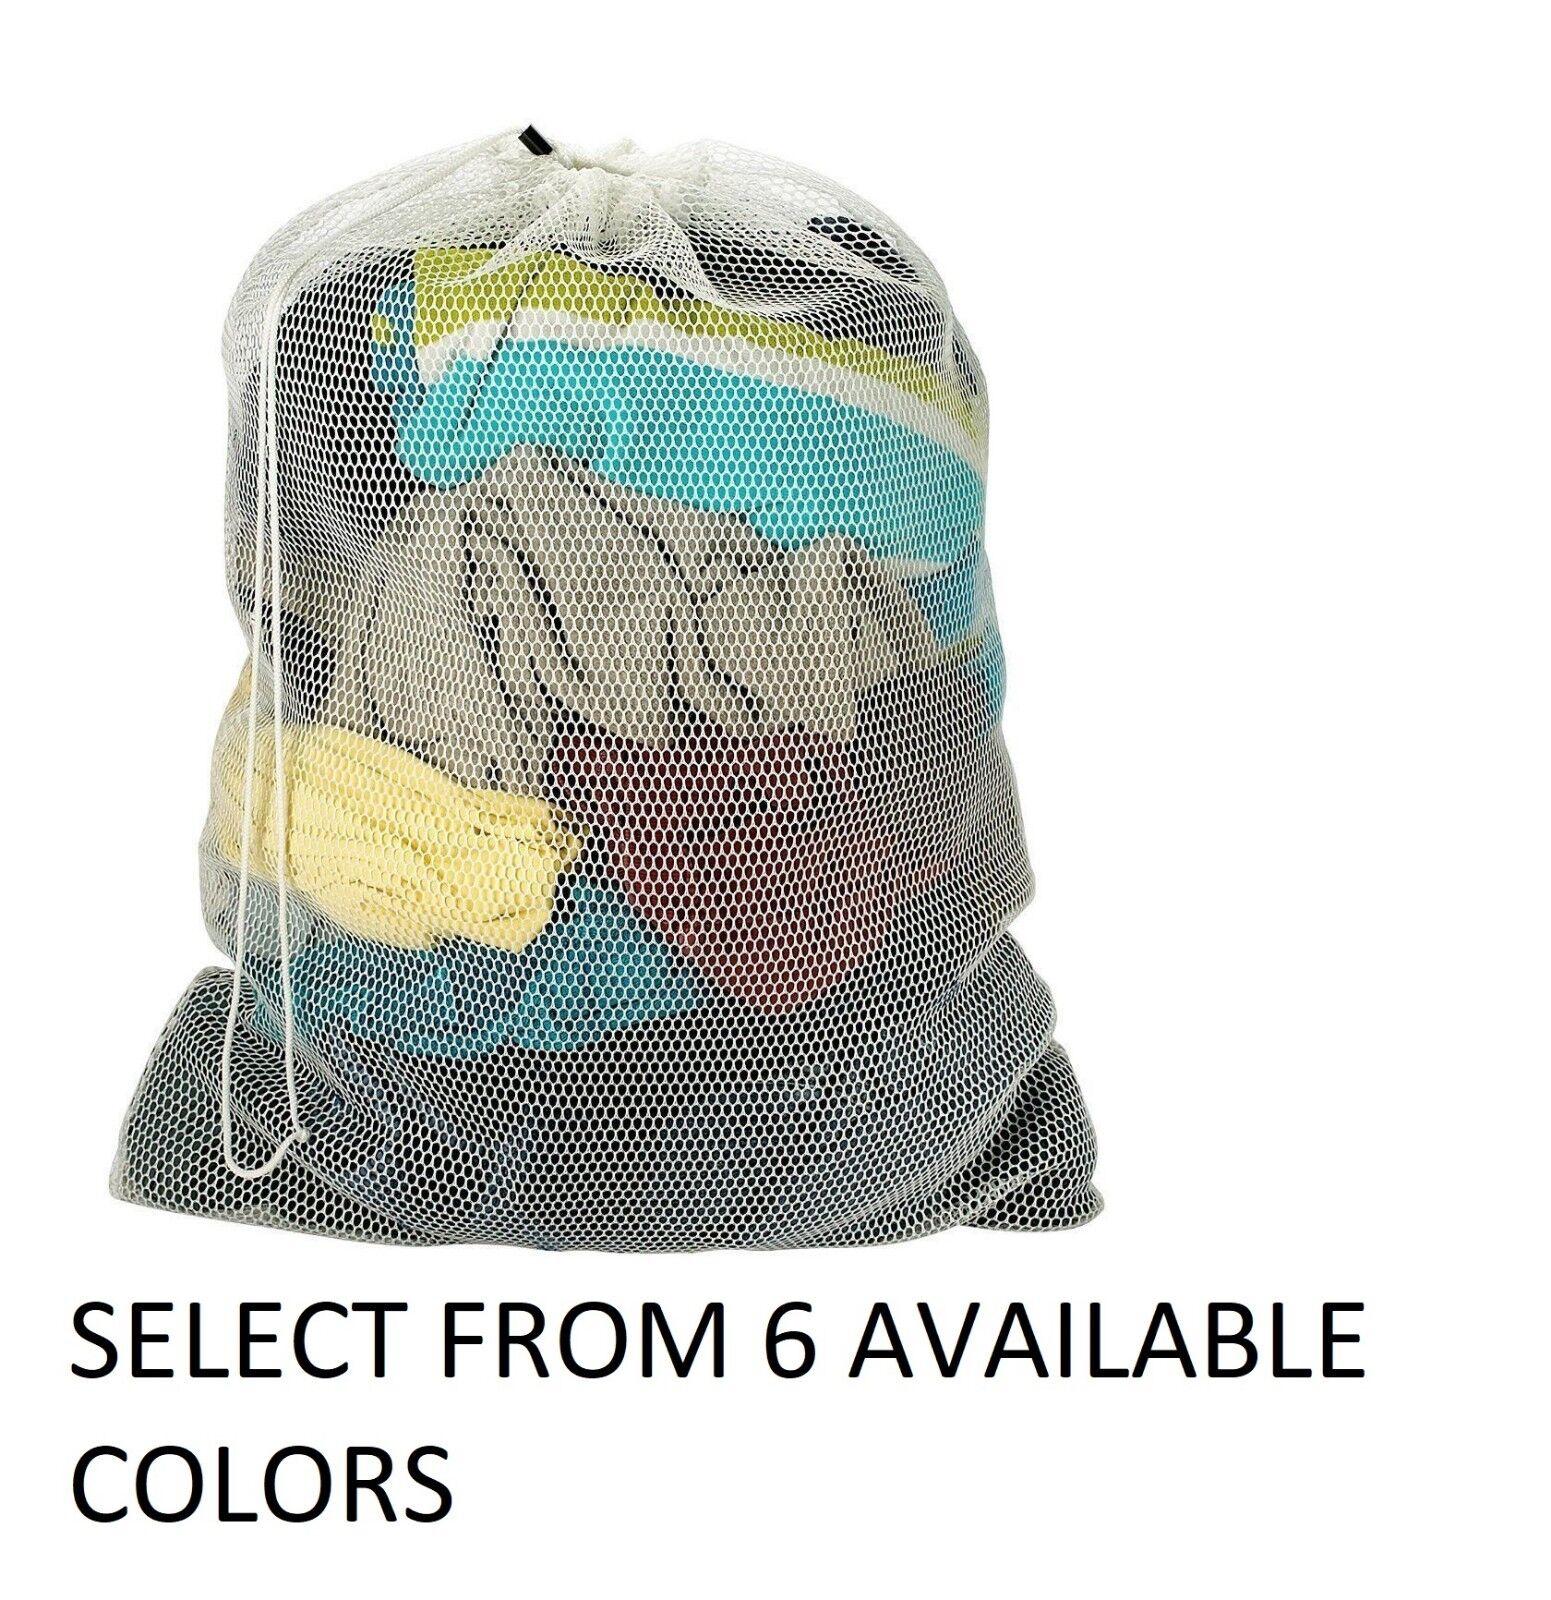 Mesh Laundry Bag- College- Dorm- Laundromat- EXTRA LARGE 24